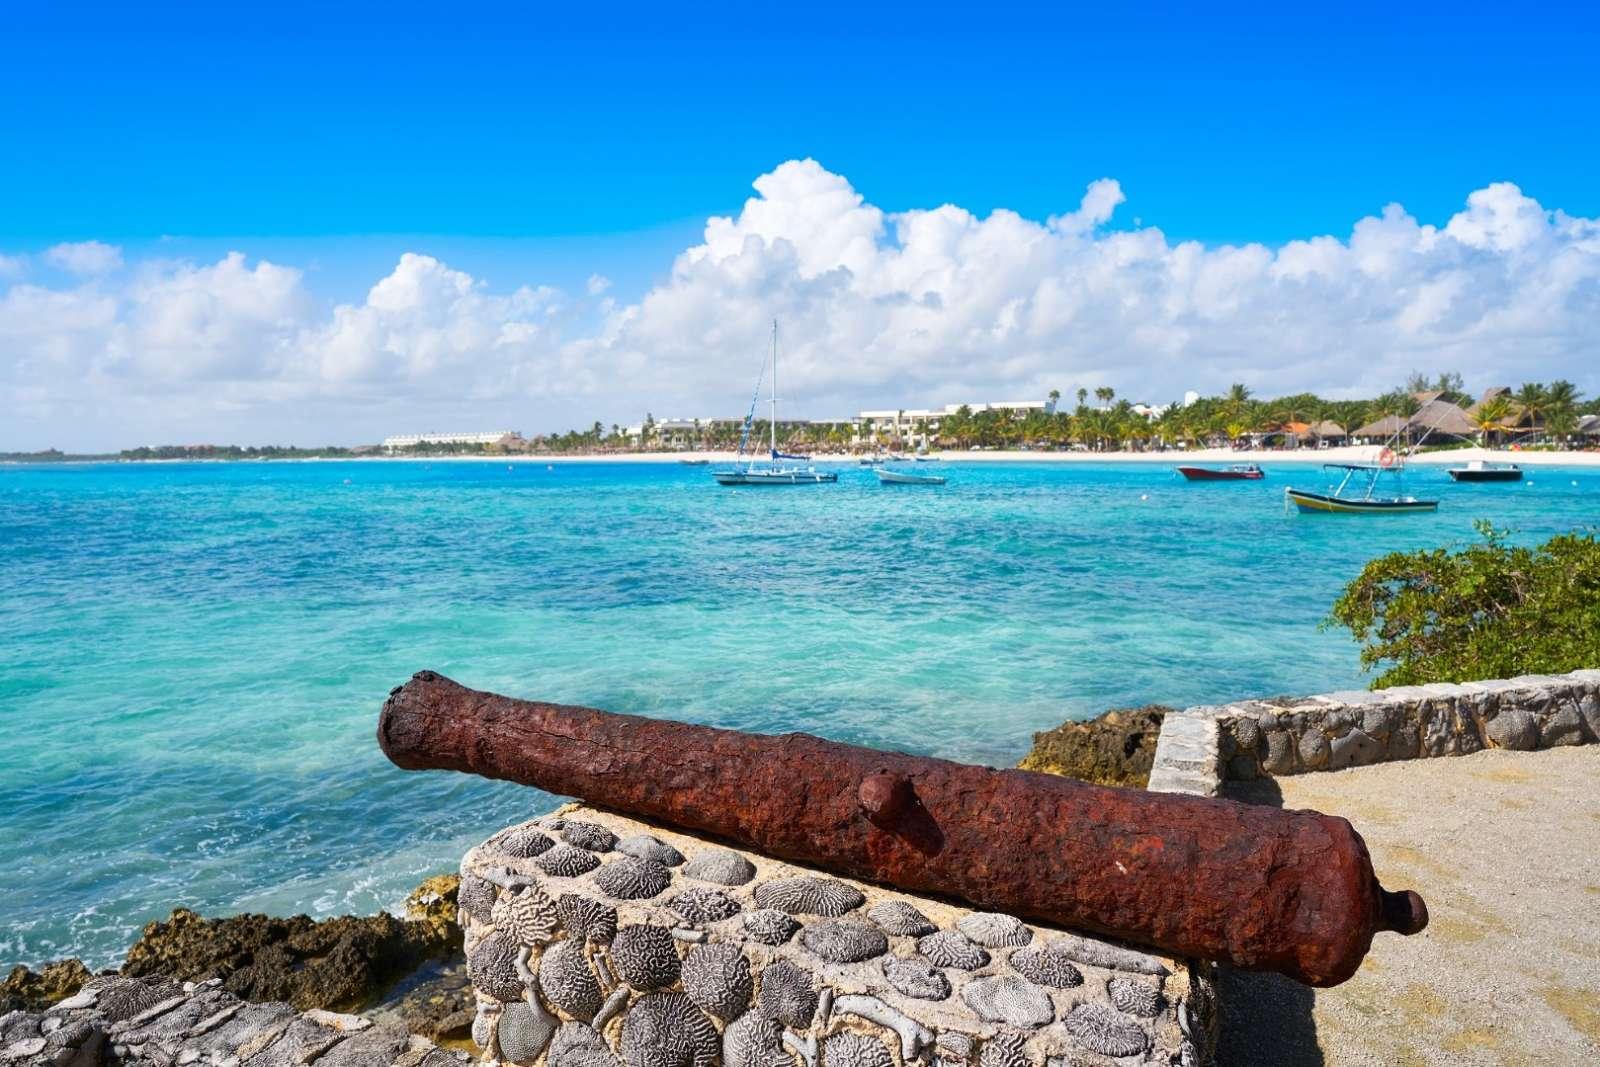 Cannon overlooking Akumal in the Riviera Maya Mexico